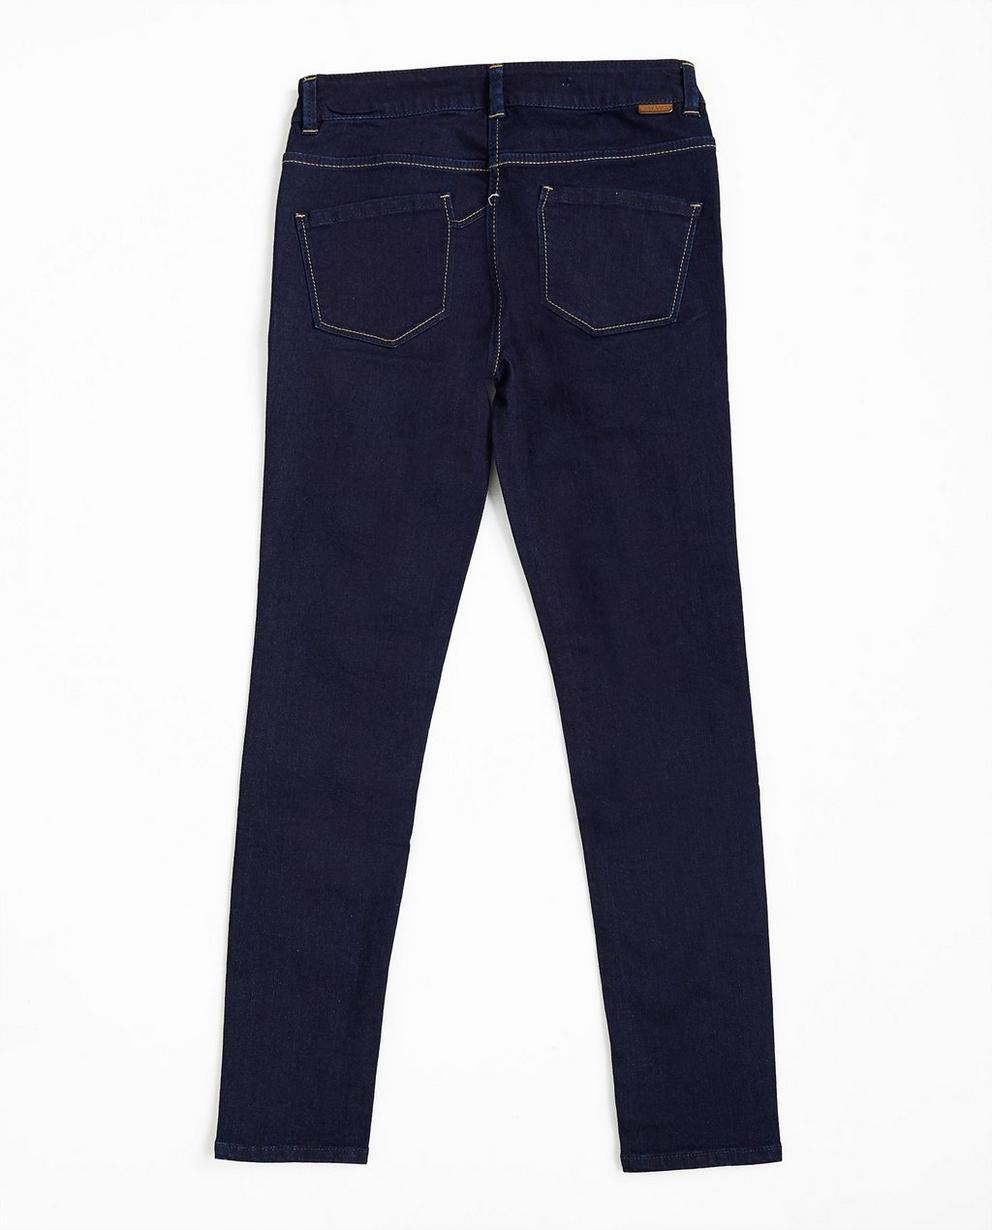 Jeans - navy - Jeans skinny MARIE